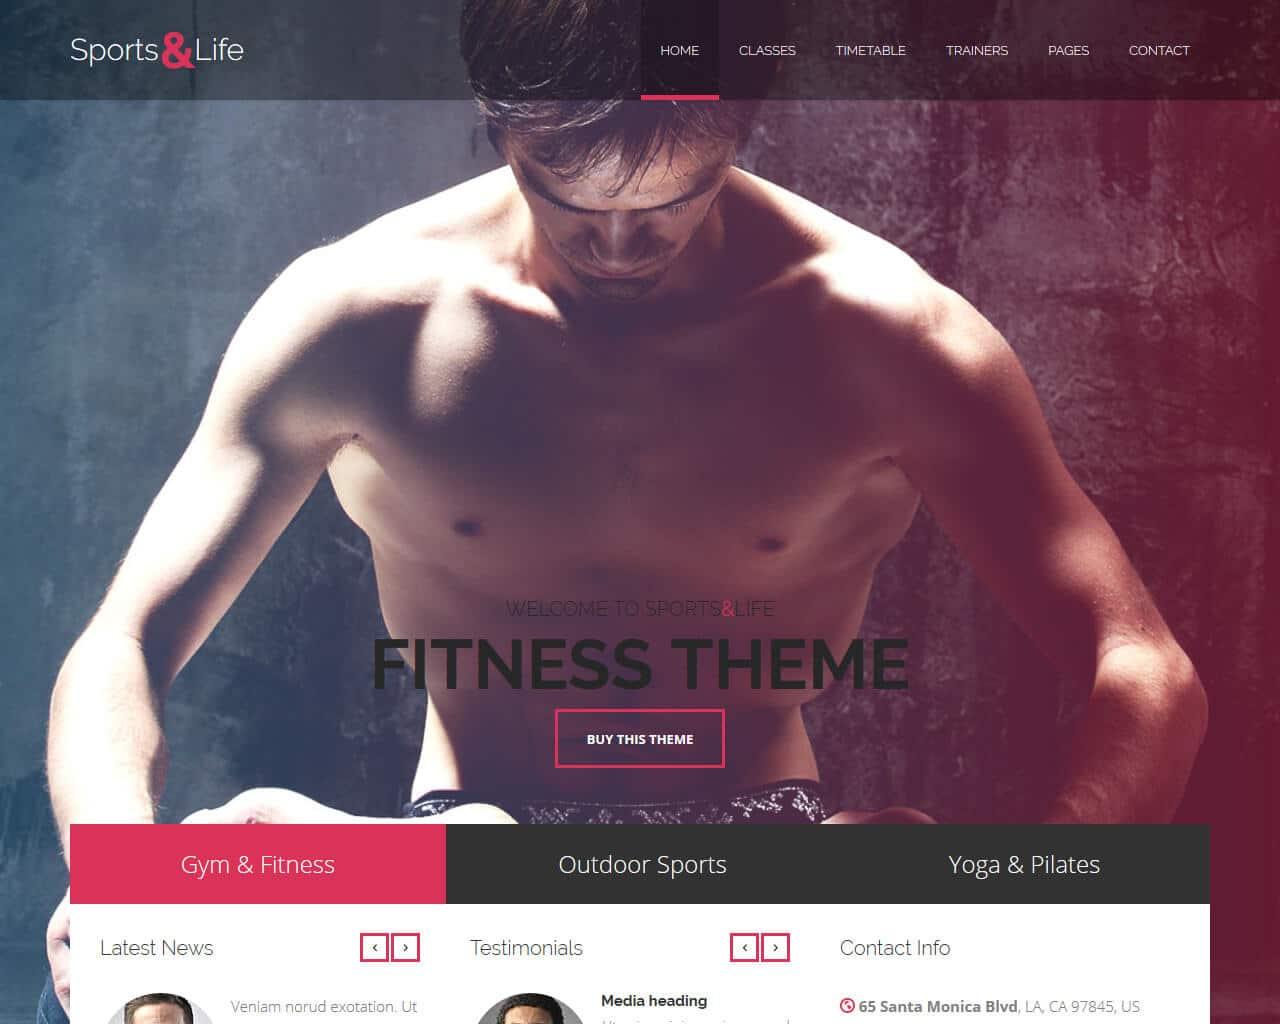 Sports&Life Website Template